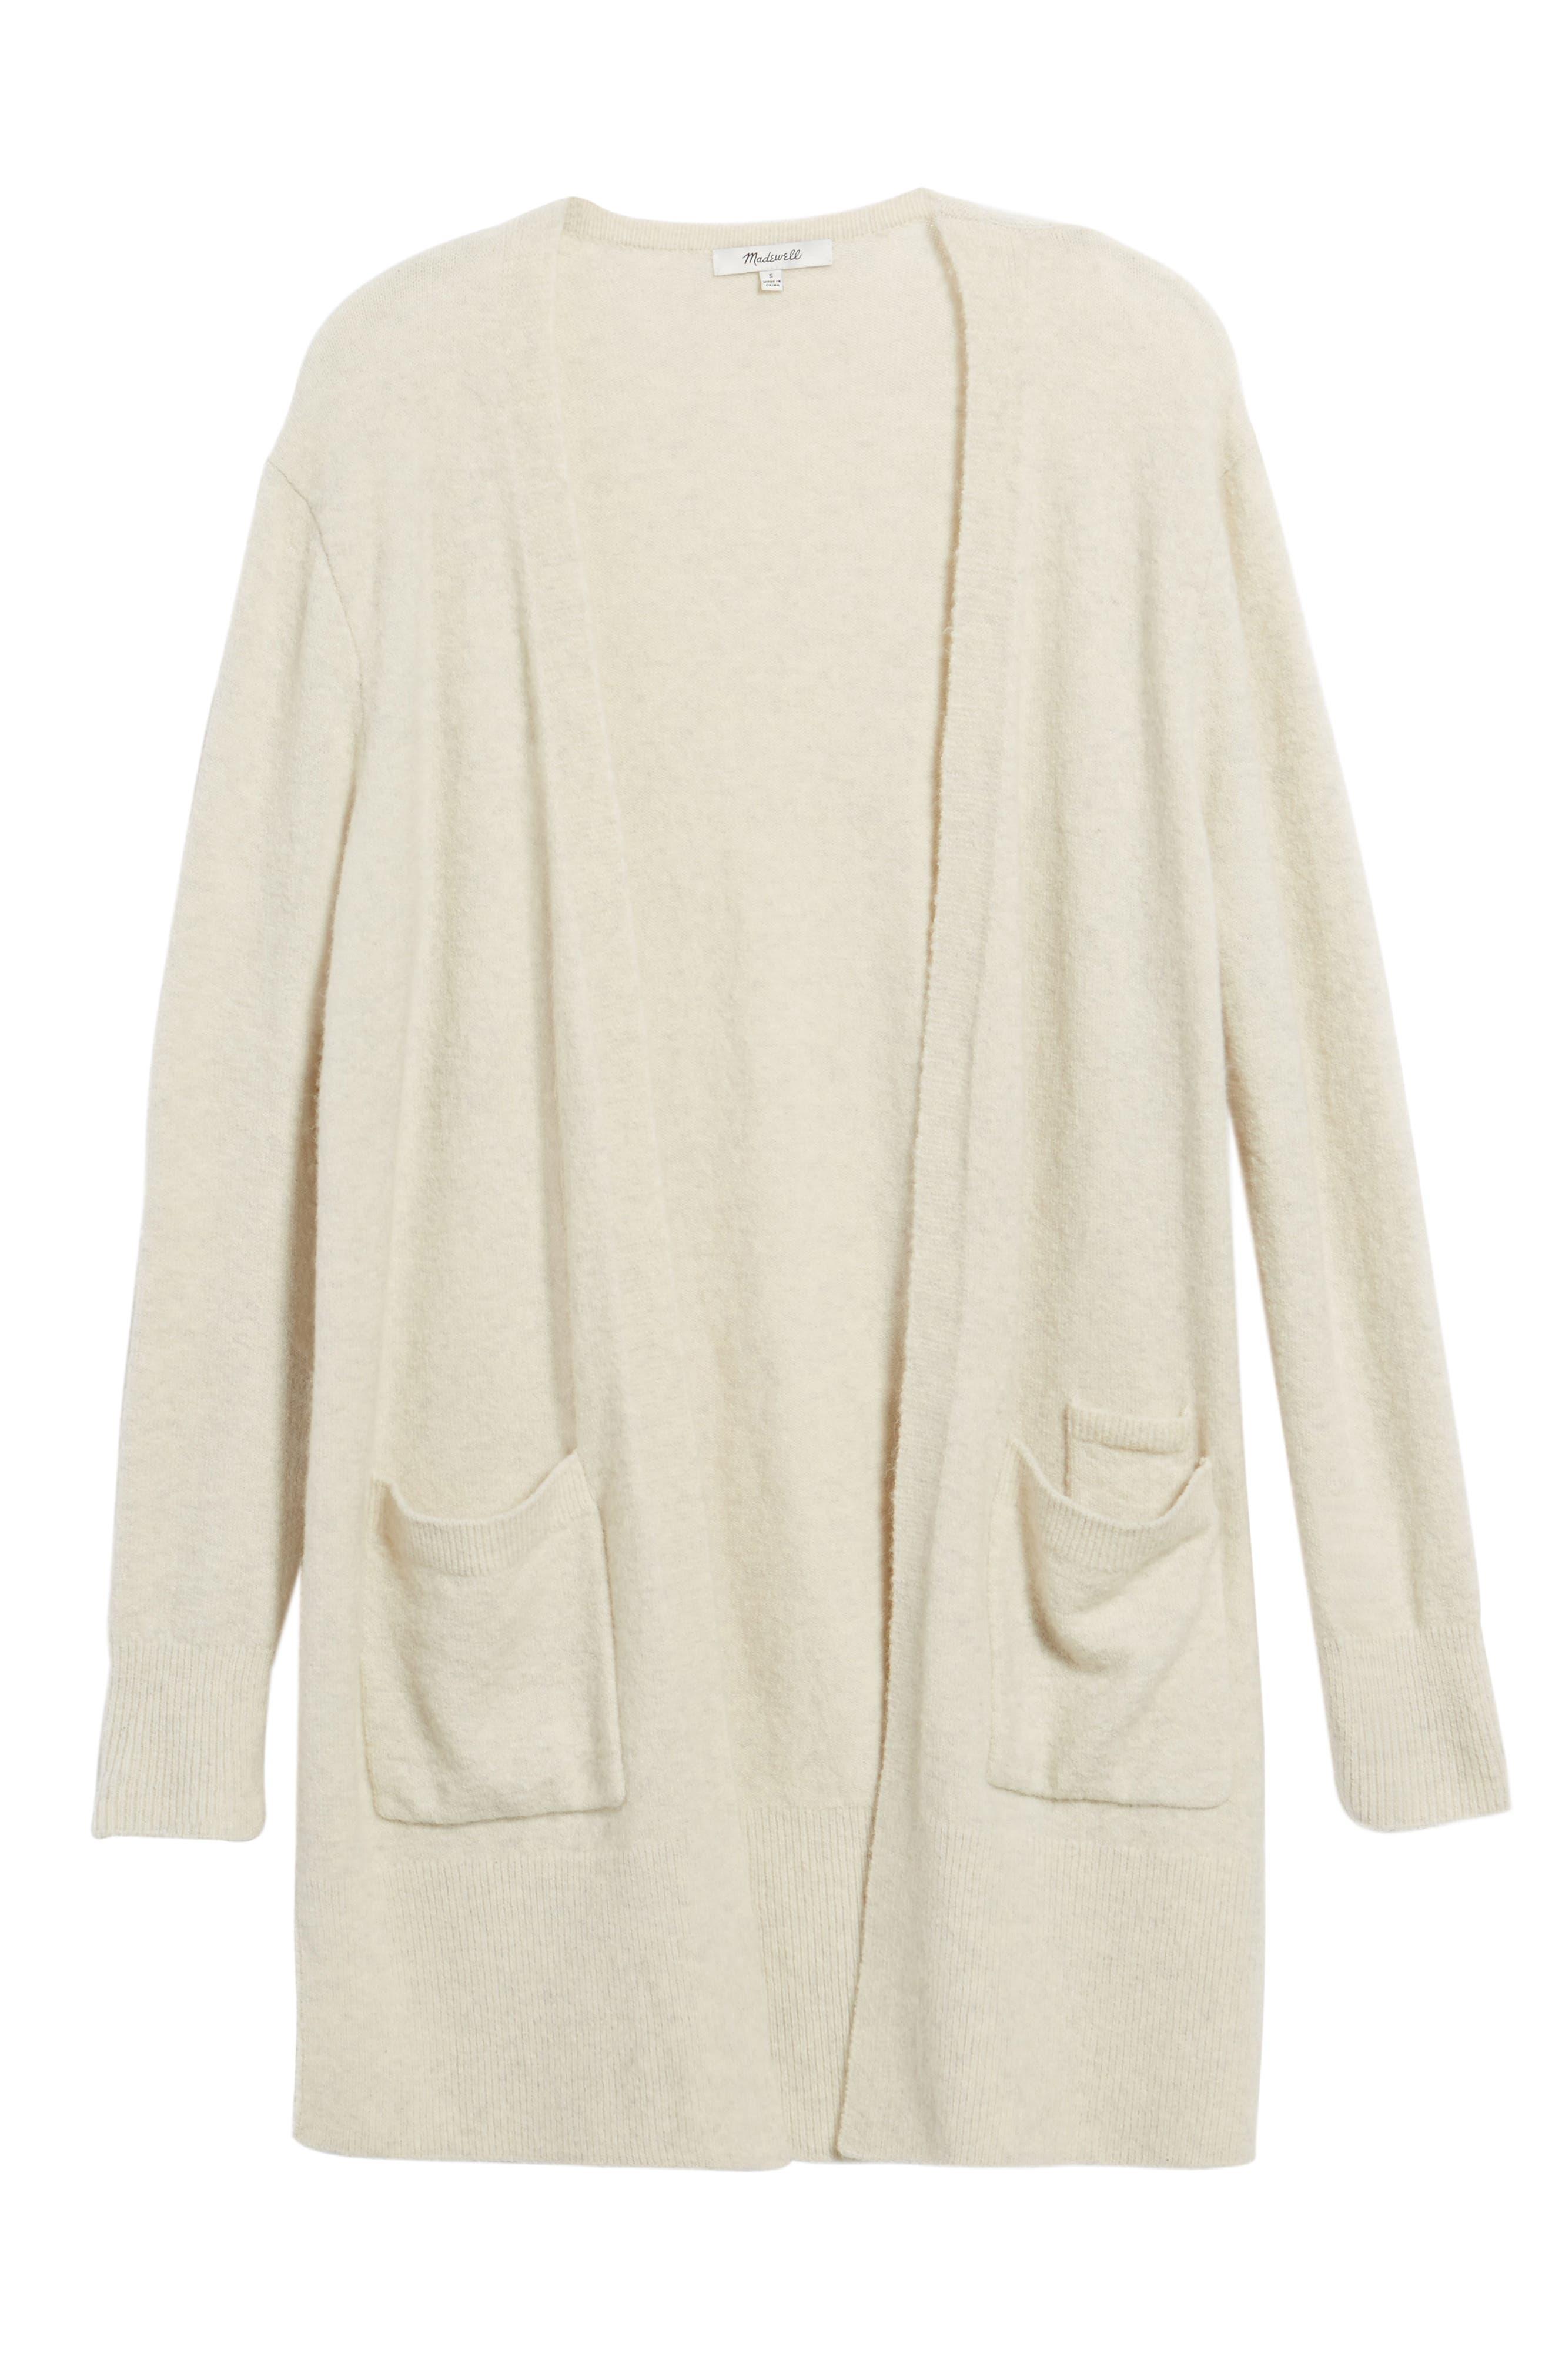 Alternate Image 1 Selected - Madewell Kent Cardigan Sweater